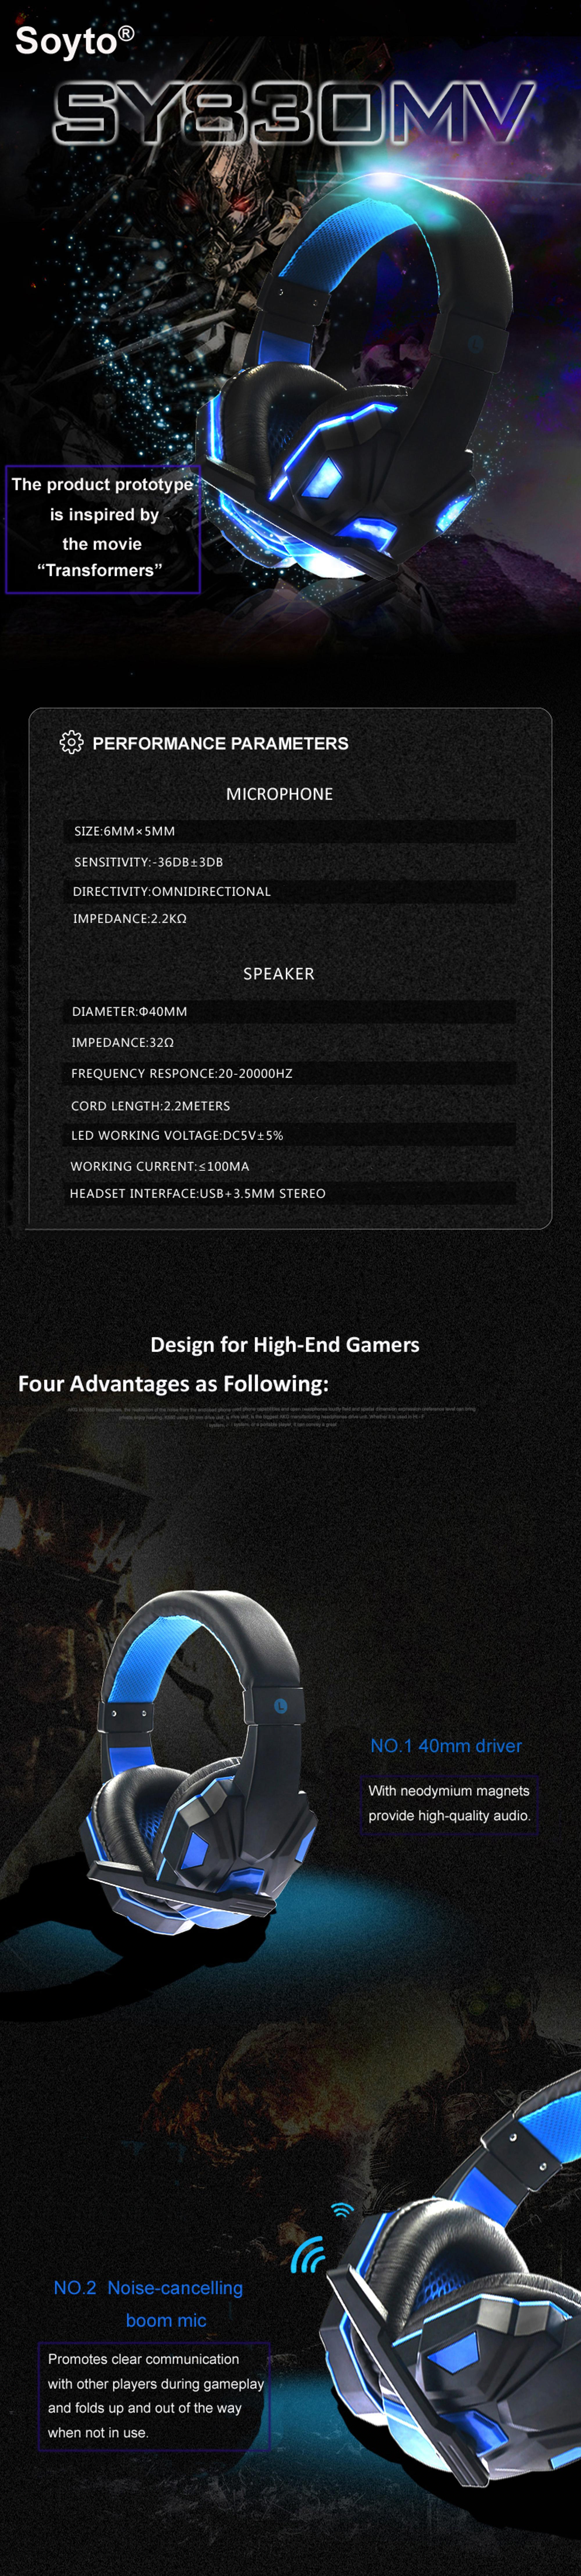 gaming headset (1).jpg